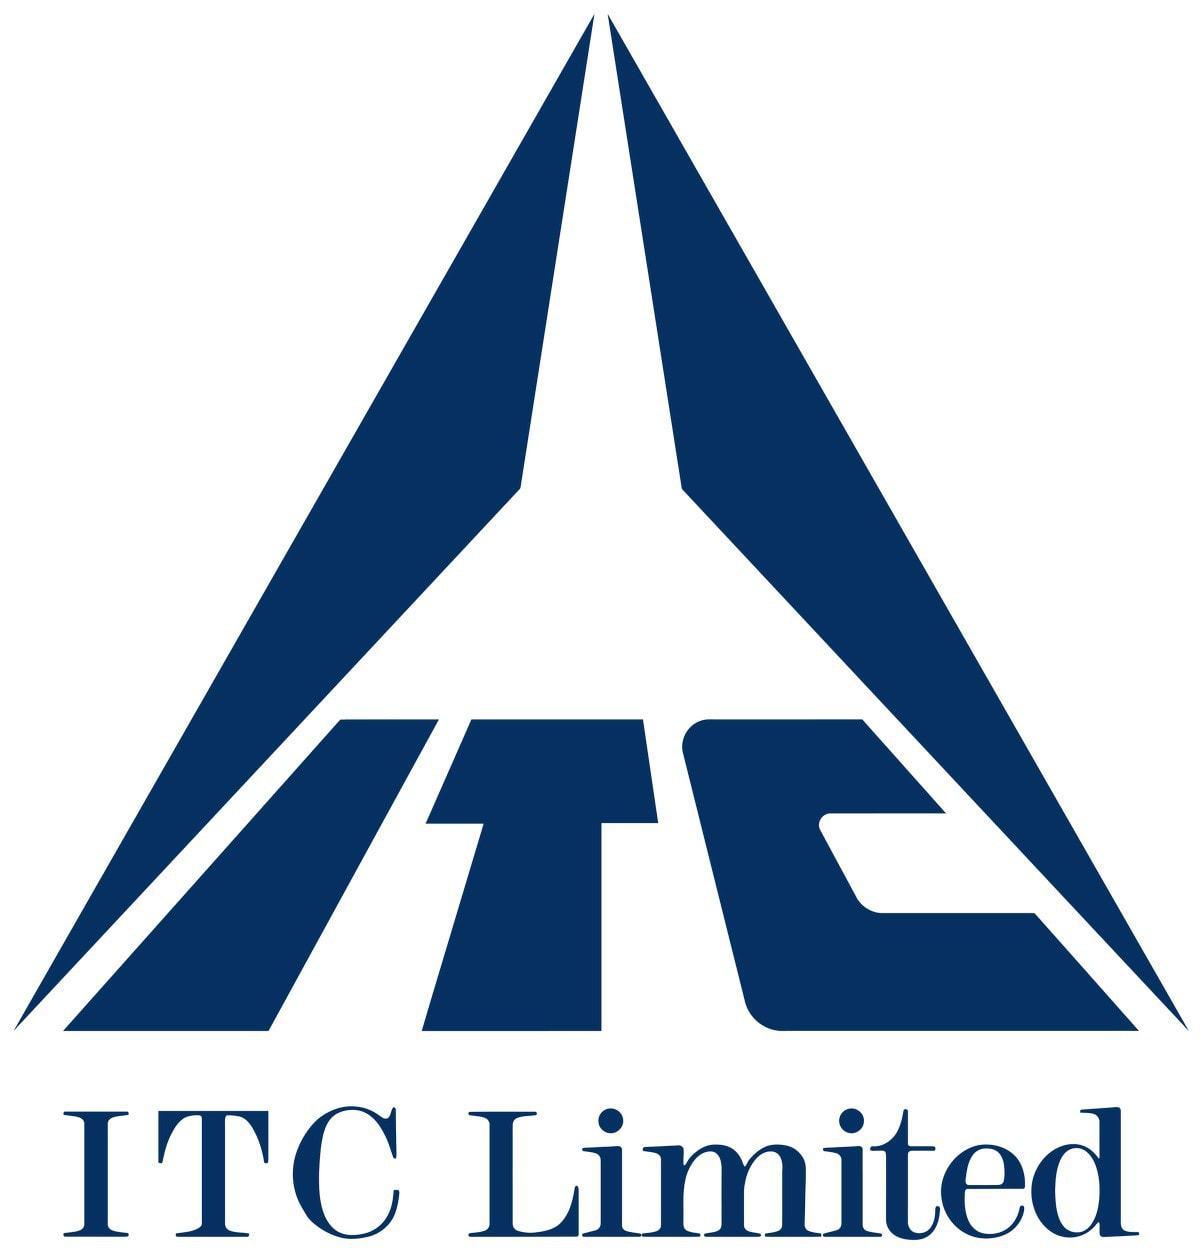 SWOT Analysis of ITC